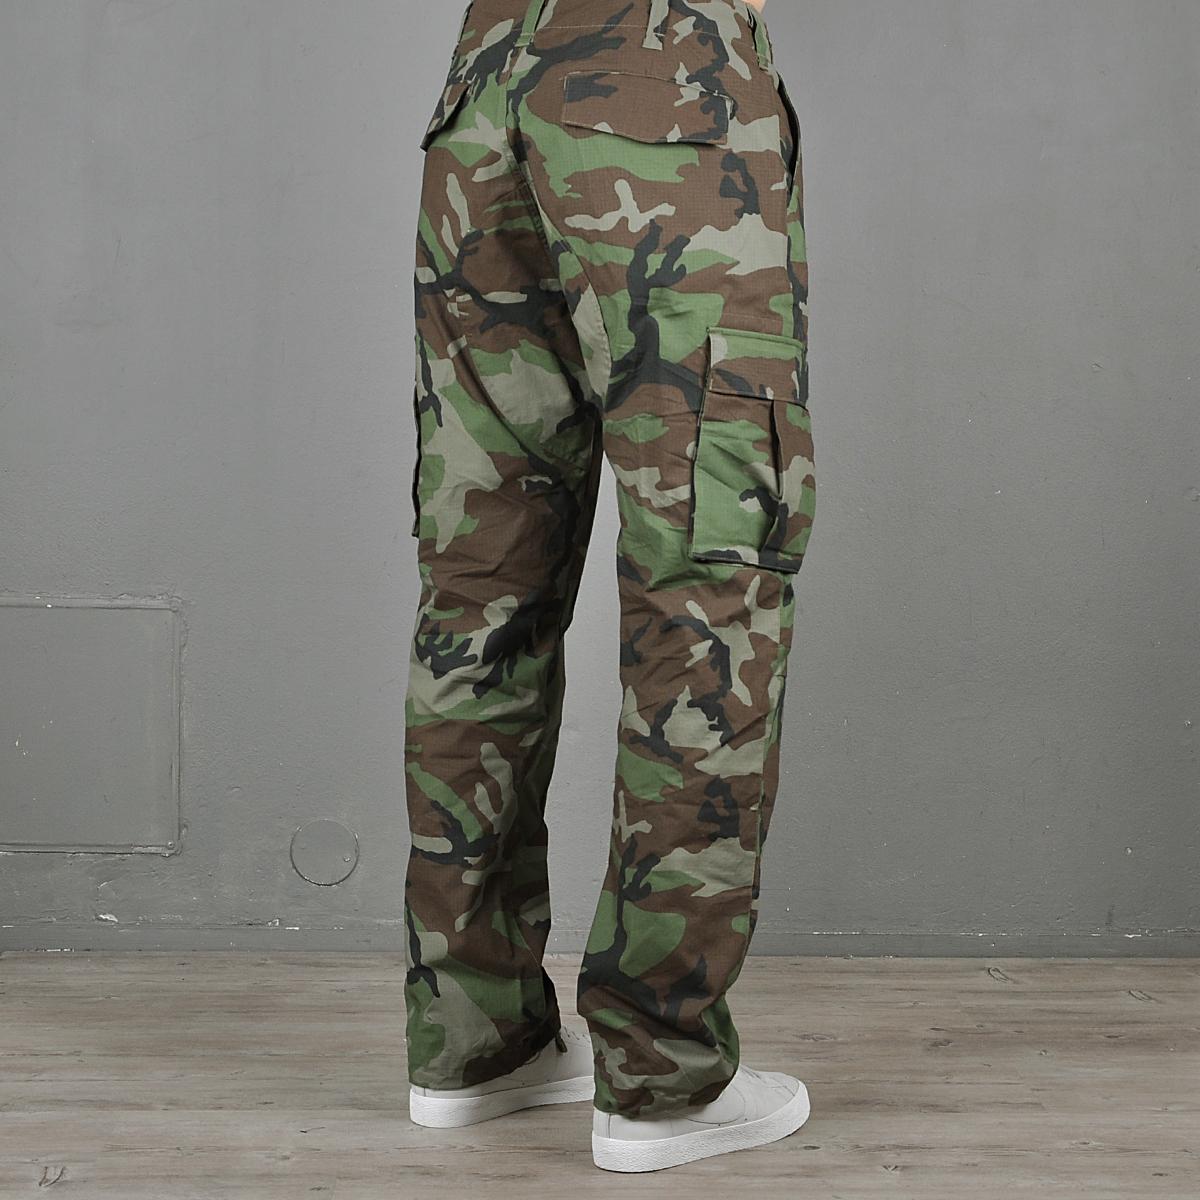 bf849b5a0d Nike SB Flex FTM Cargo pant, woodland camo | Beyond